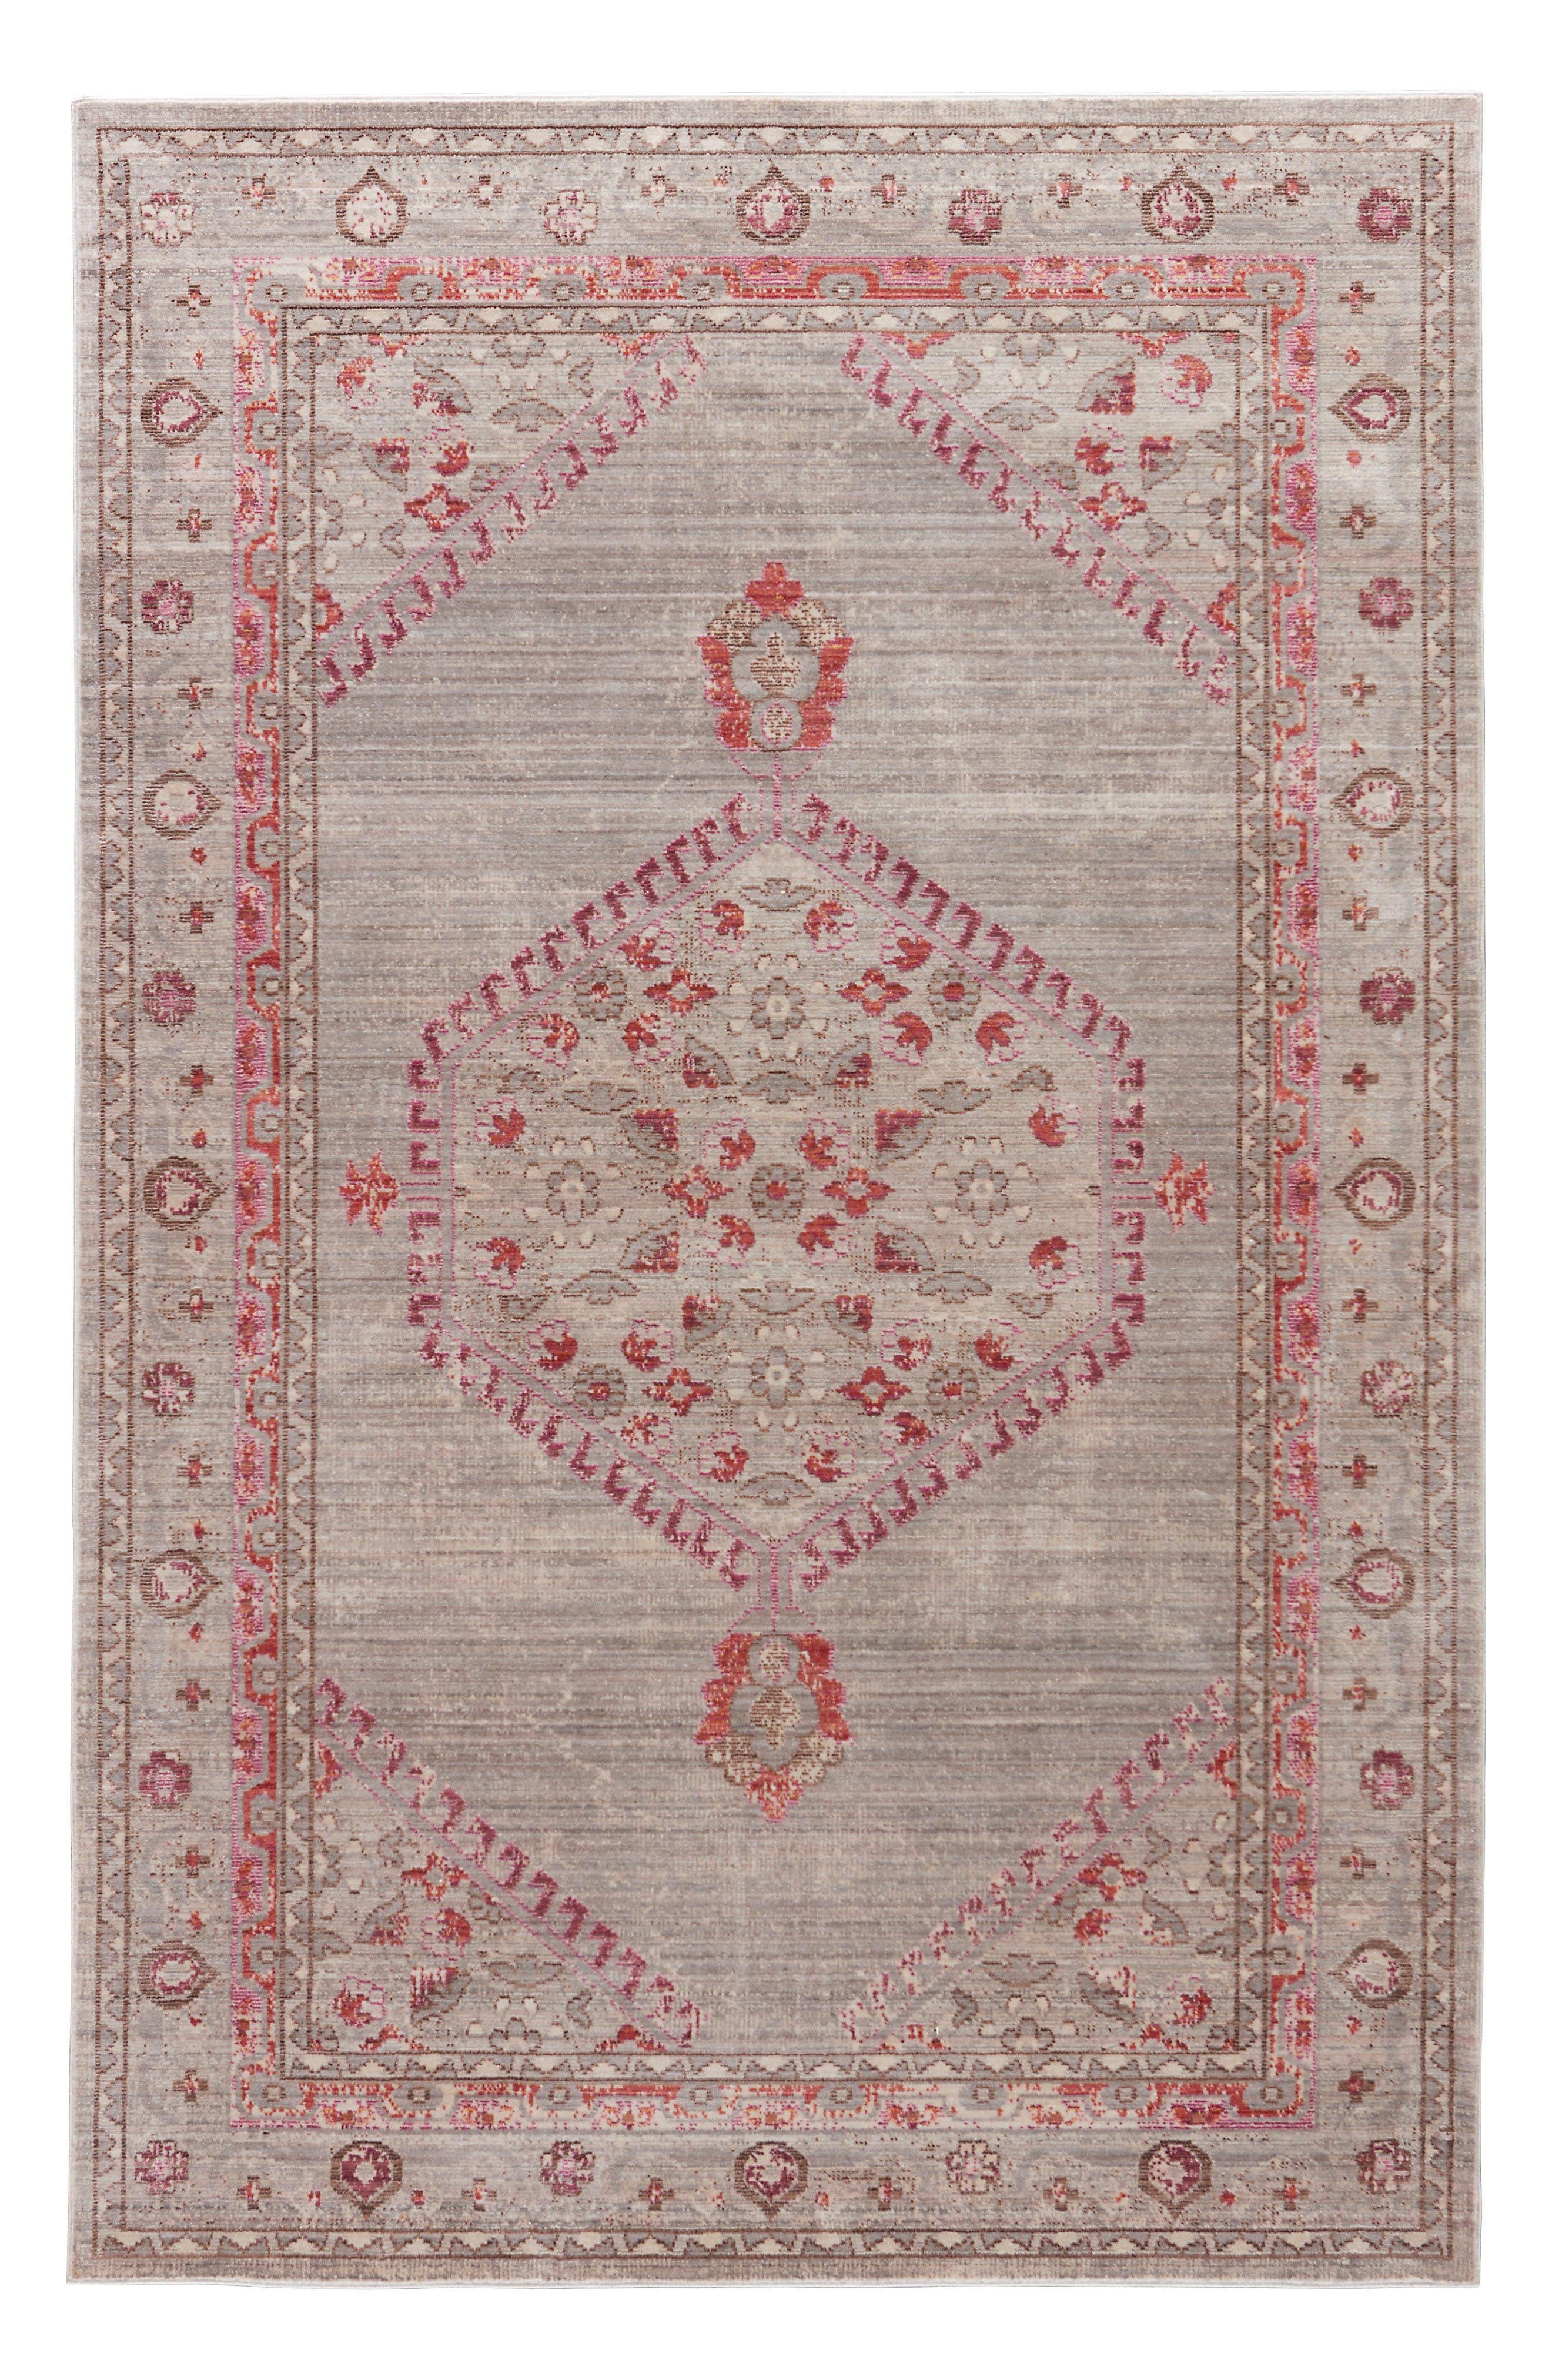 Jaipur Contemporary Vintage Rug